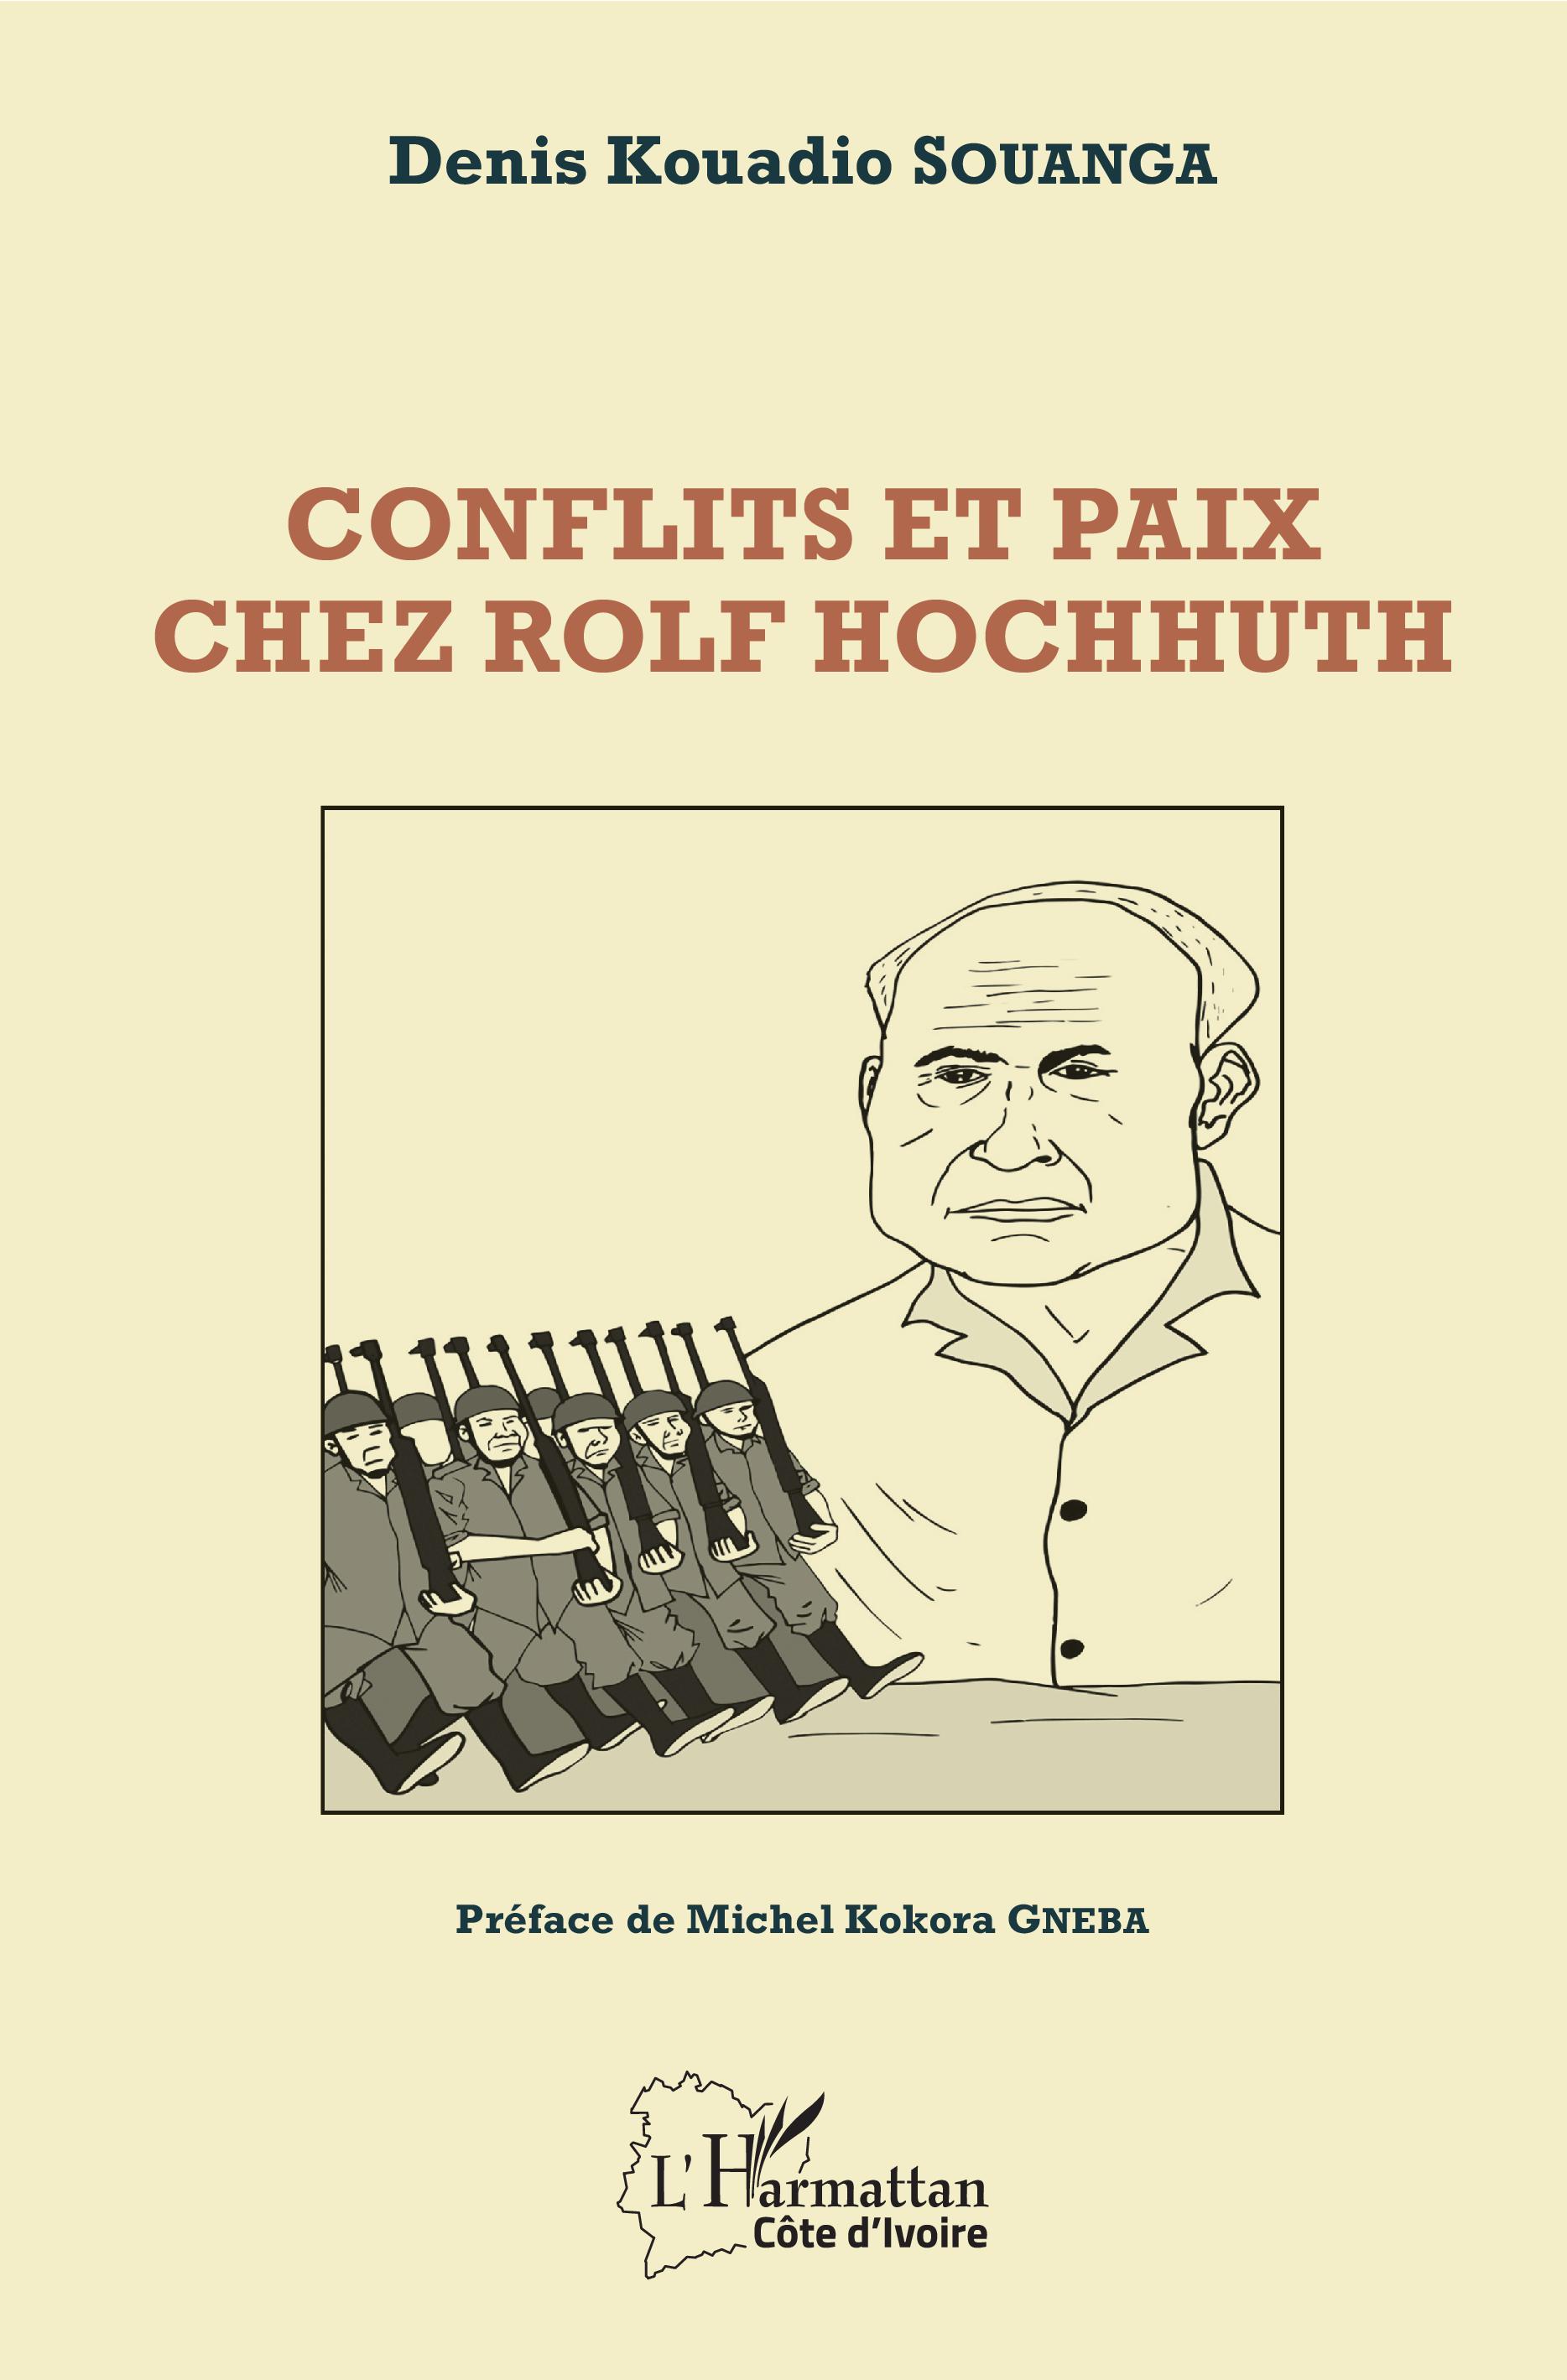 D. K. Souanga, Conflits et paix chez Rolf Hochhuth